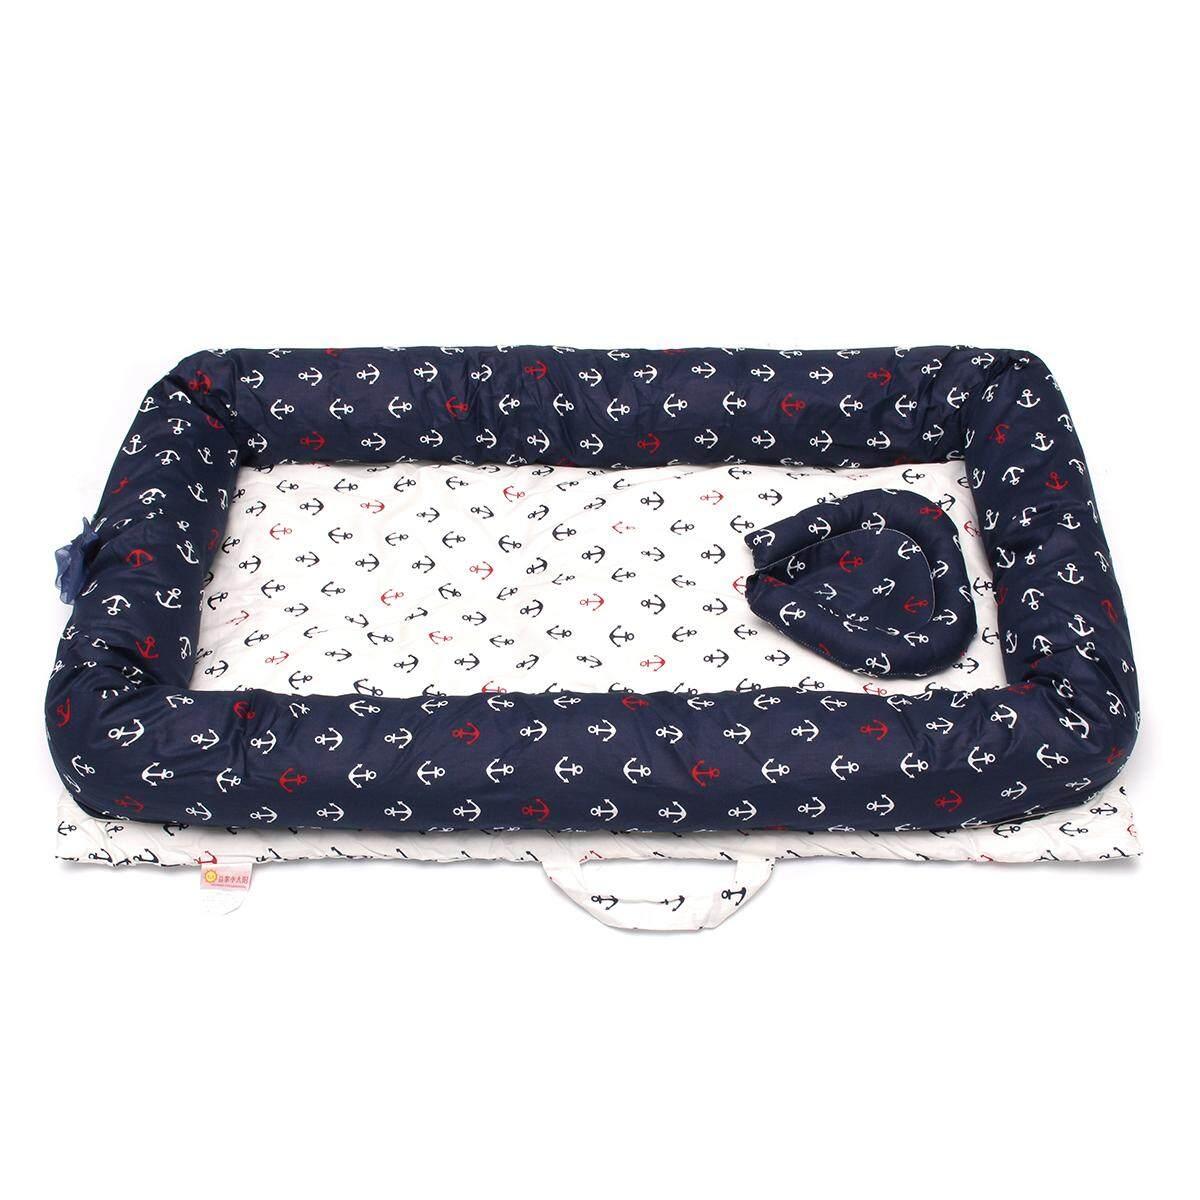 c0341faa0 Newborn Baby Nest Crib Sleep Snuggle Cot Bed Pod Bumper Soft Comfort Toddler